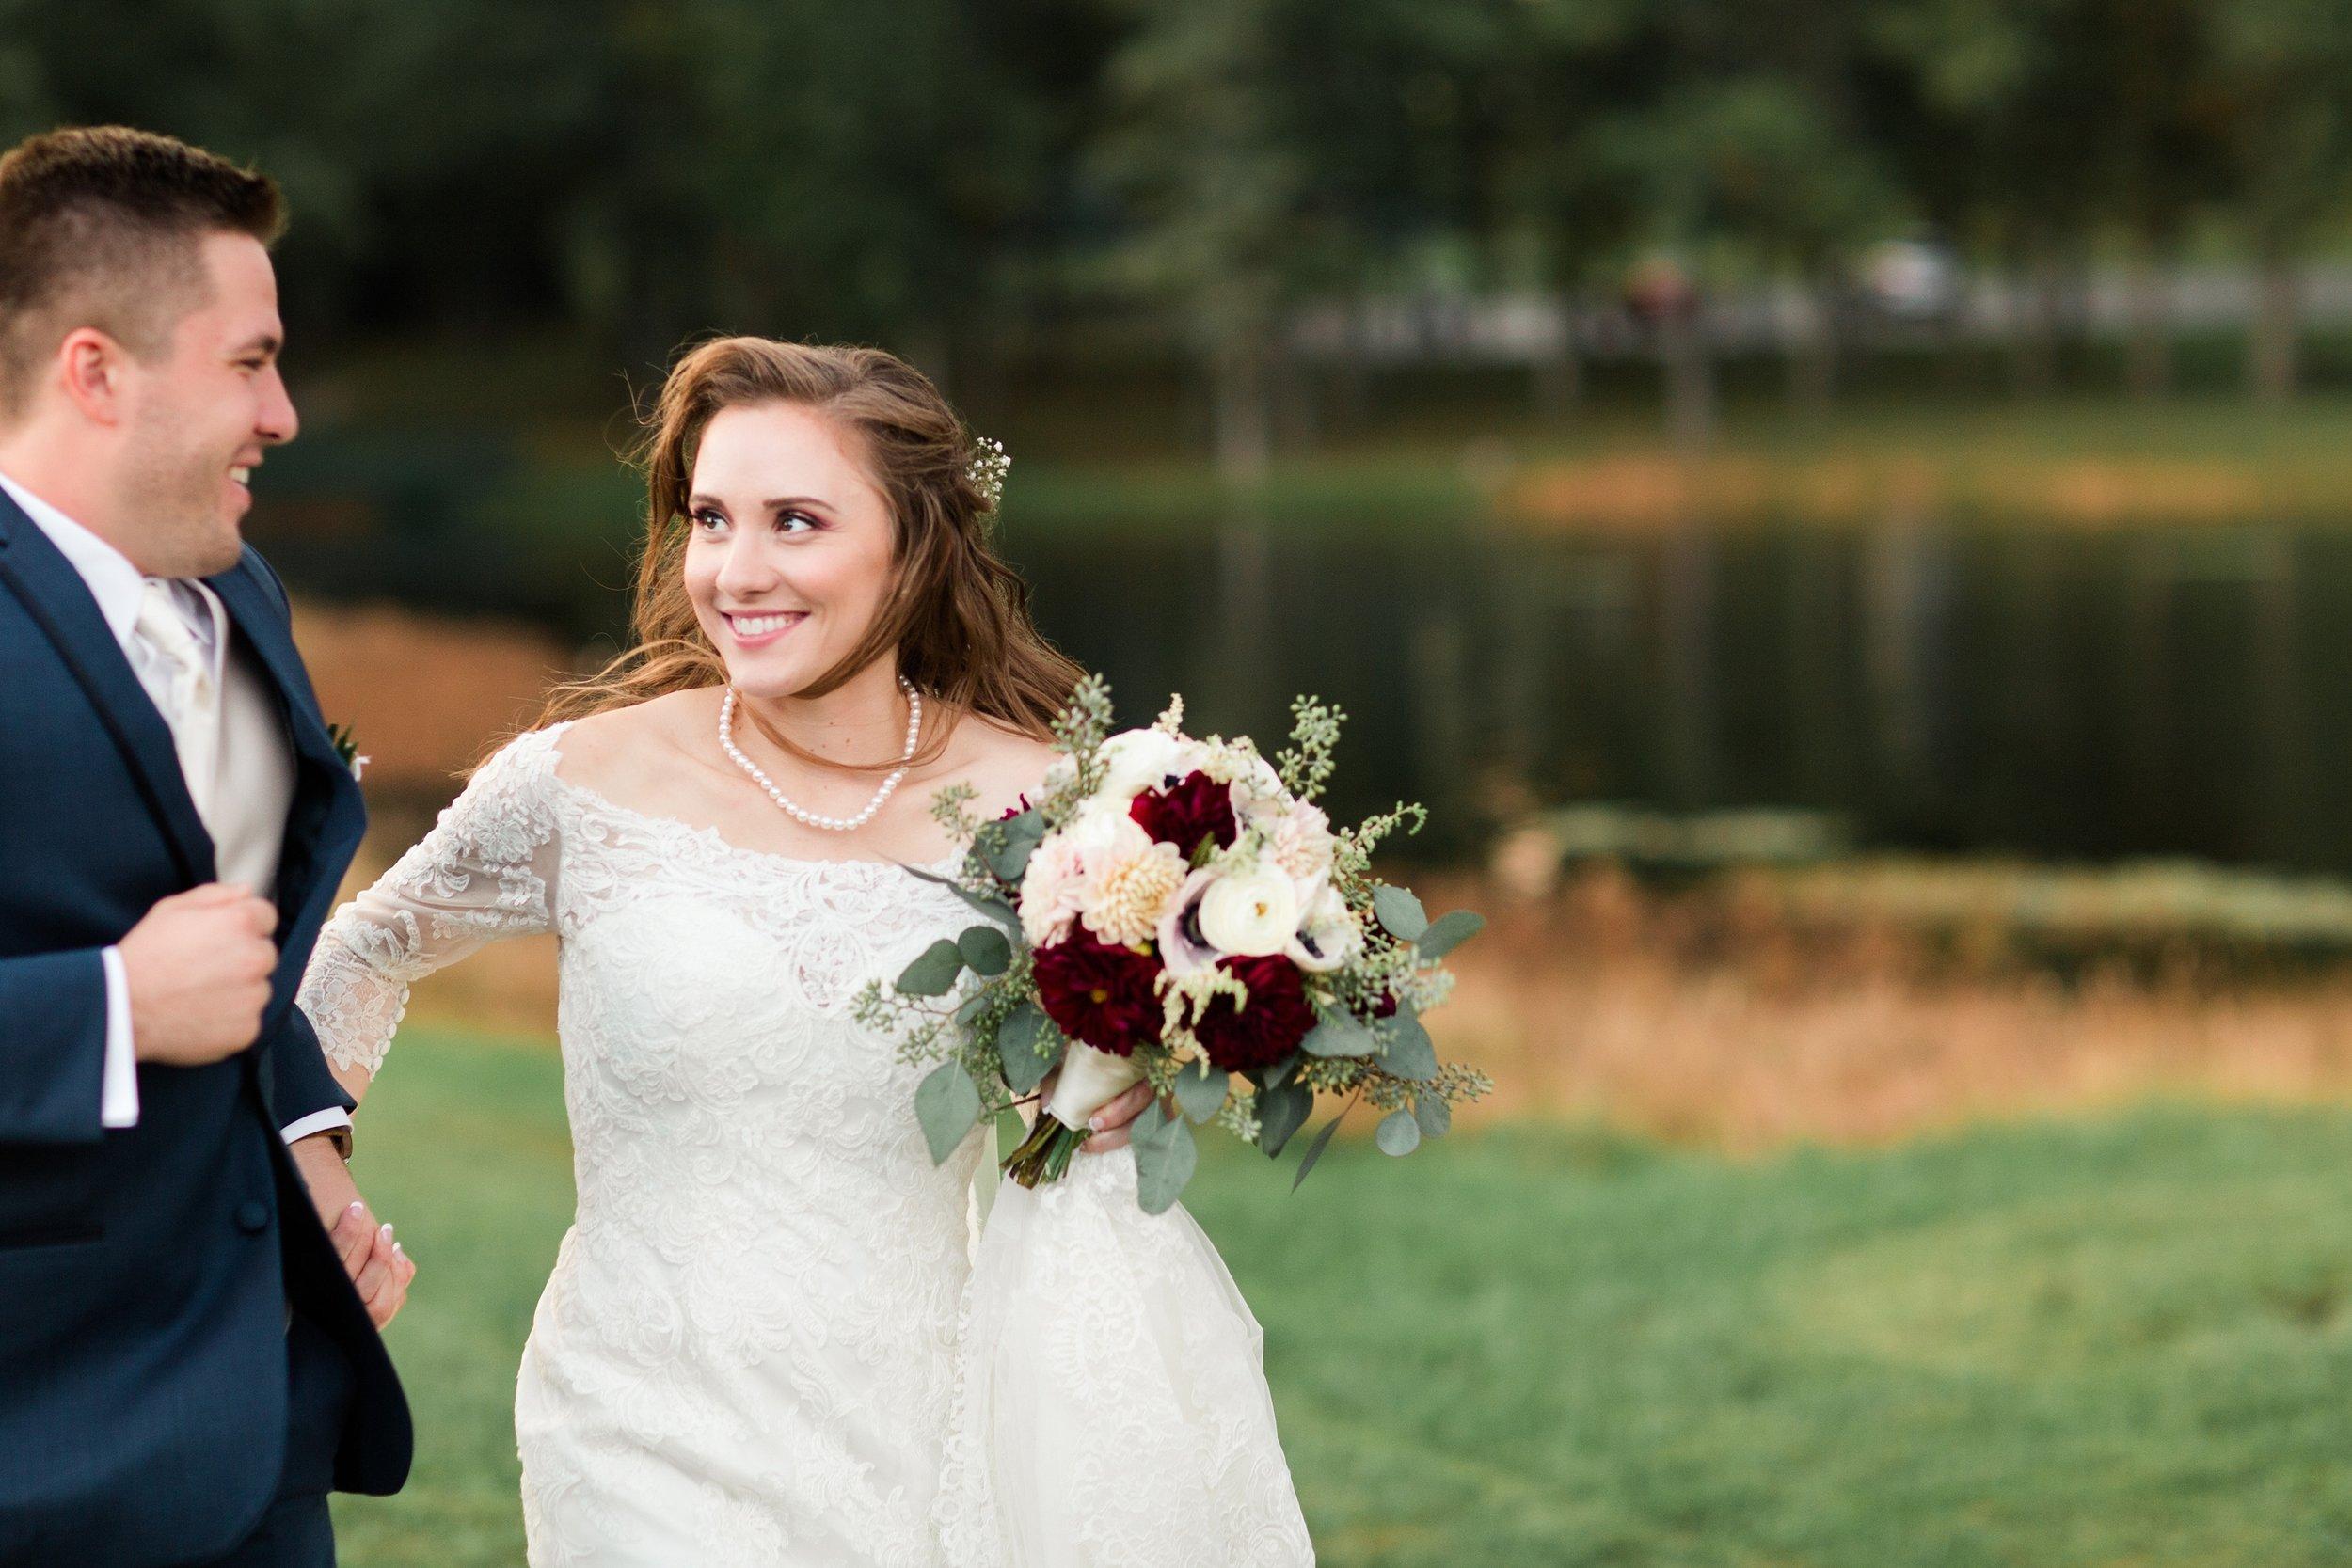 Oklahoma City Wedding Photographer- Jessica McBroom